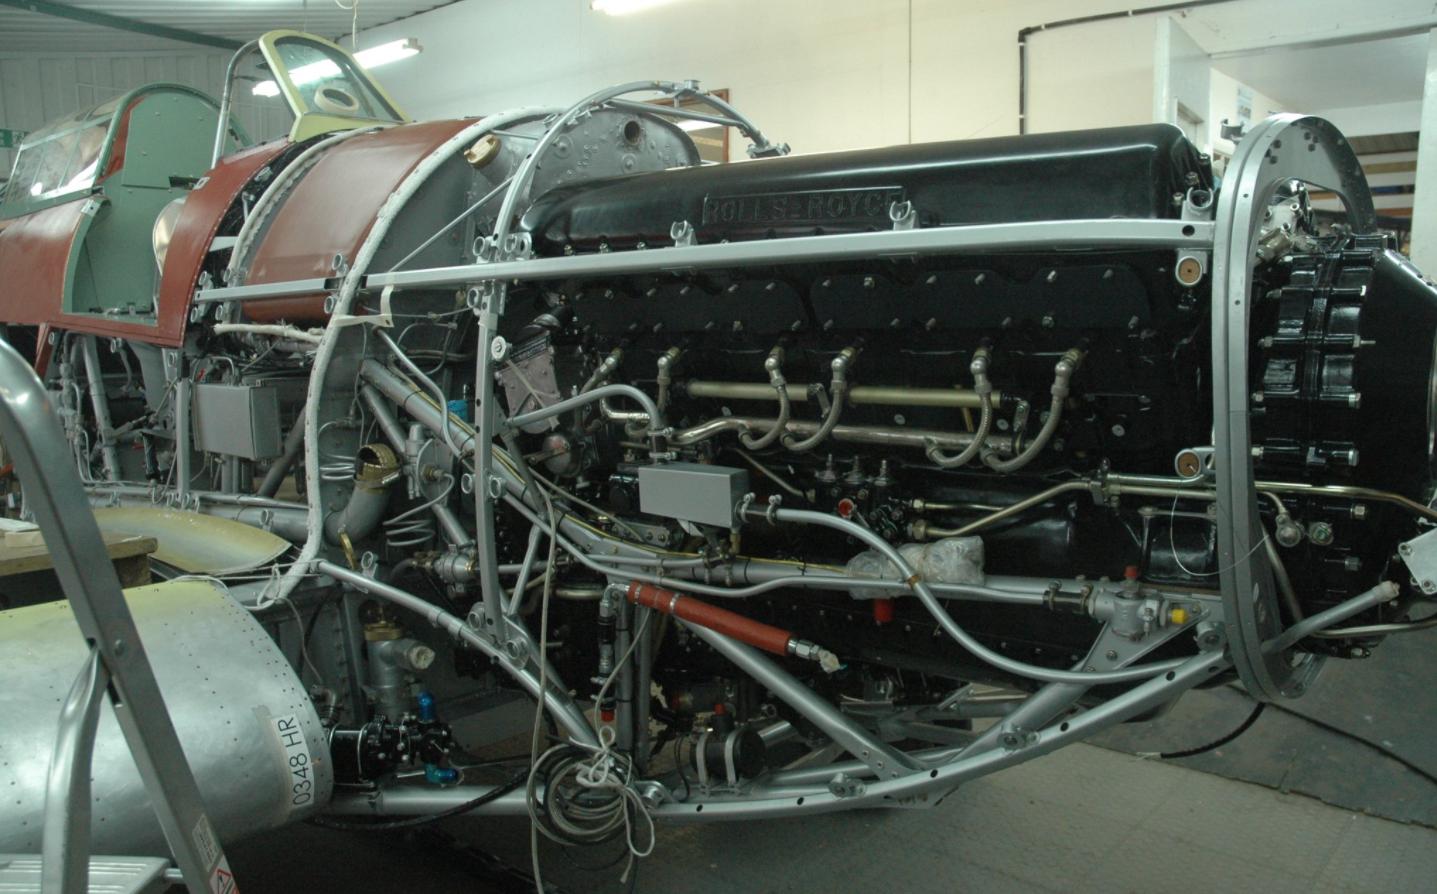 Hawker Hurricane V7497 restoration update - August 2016 - Rolls-Royce Merlin III engine